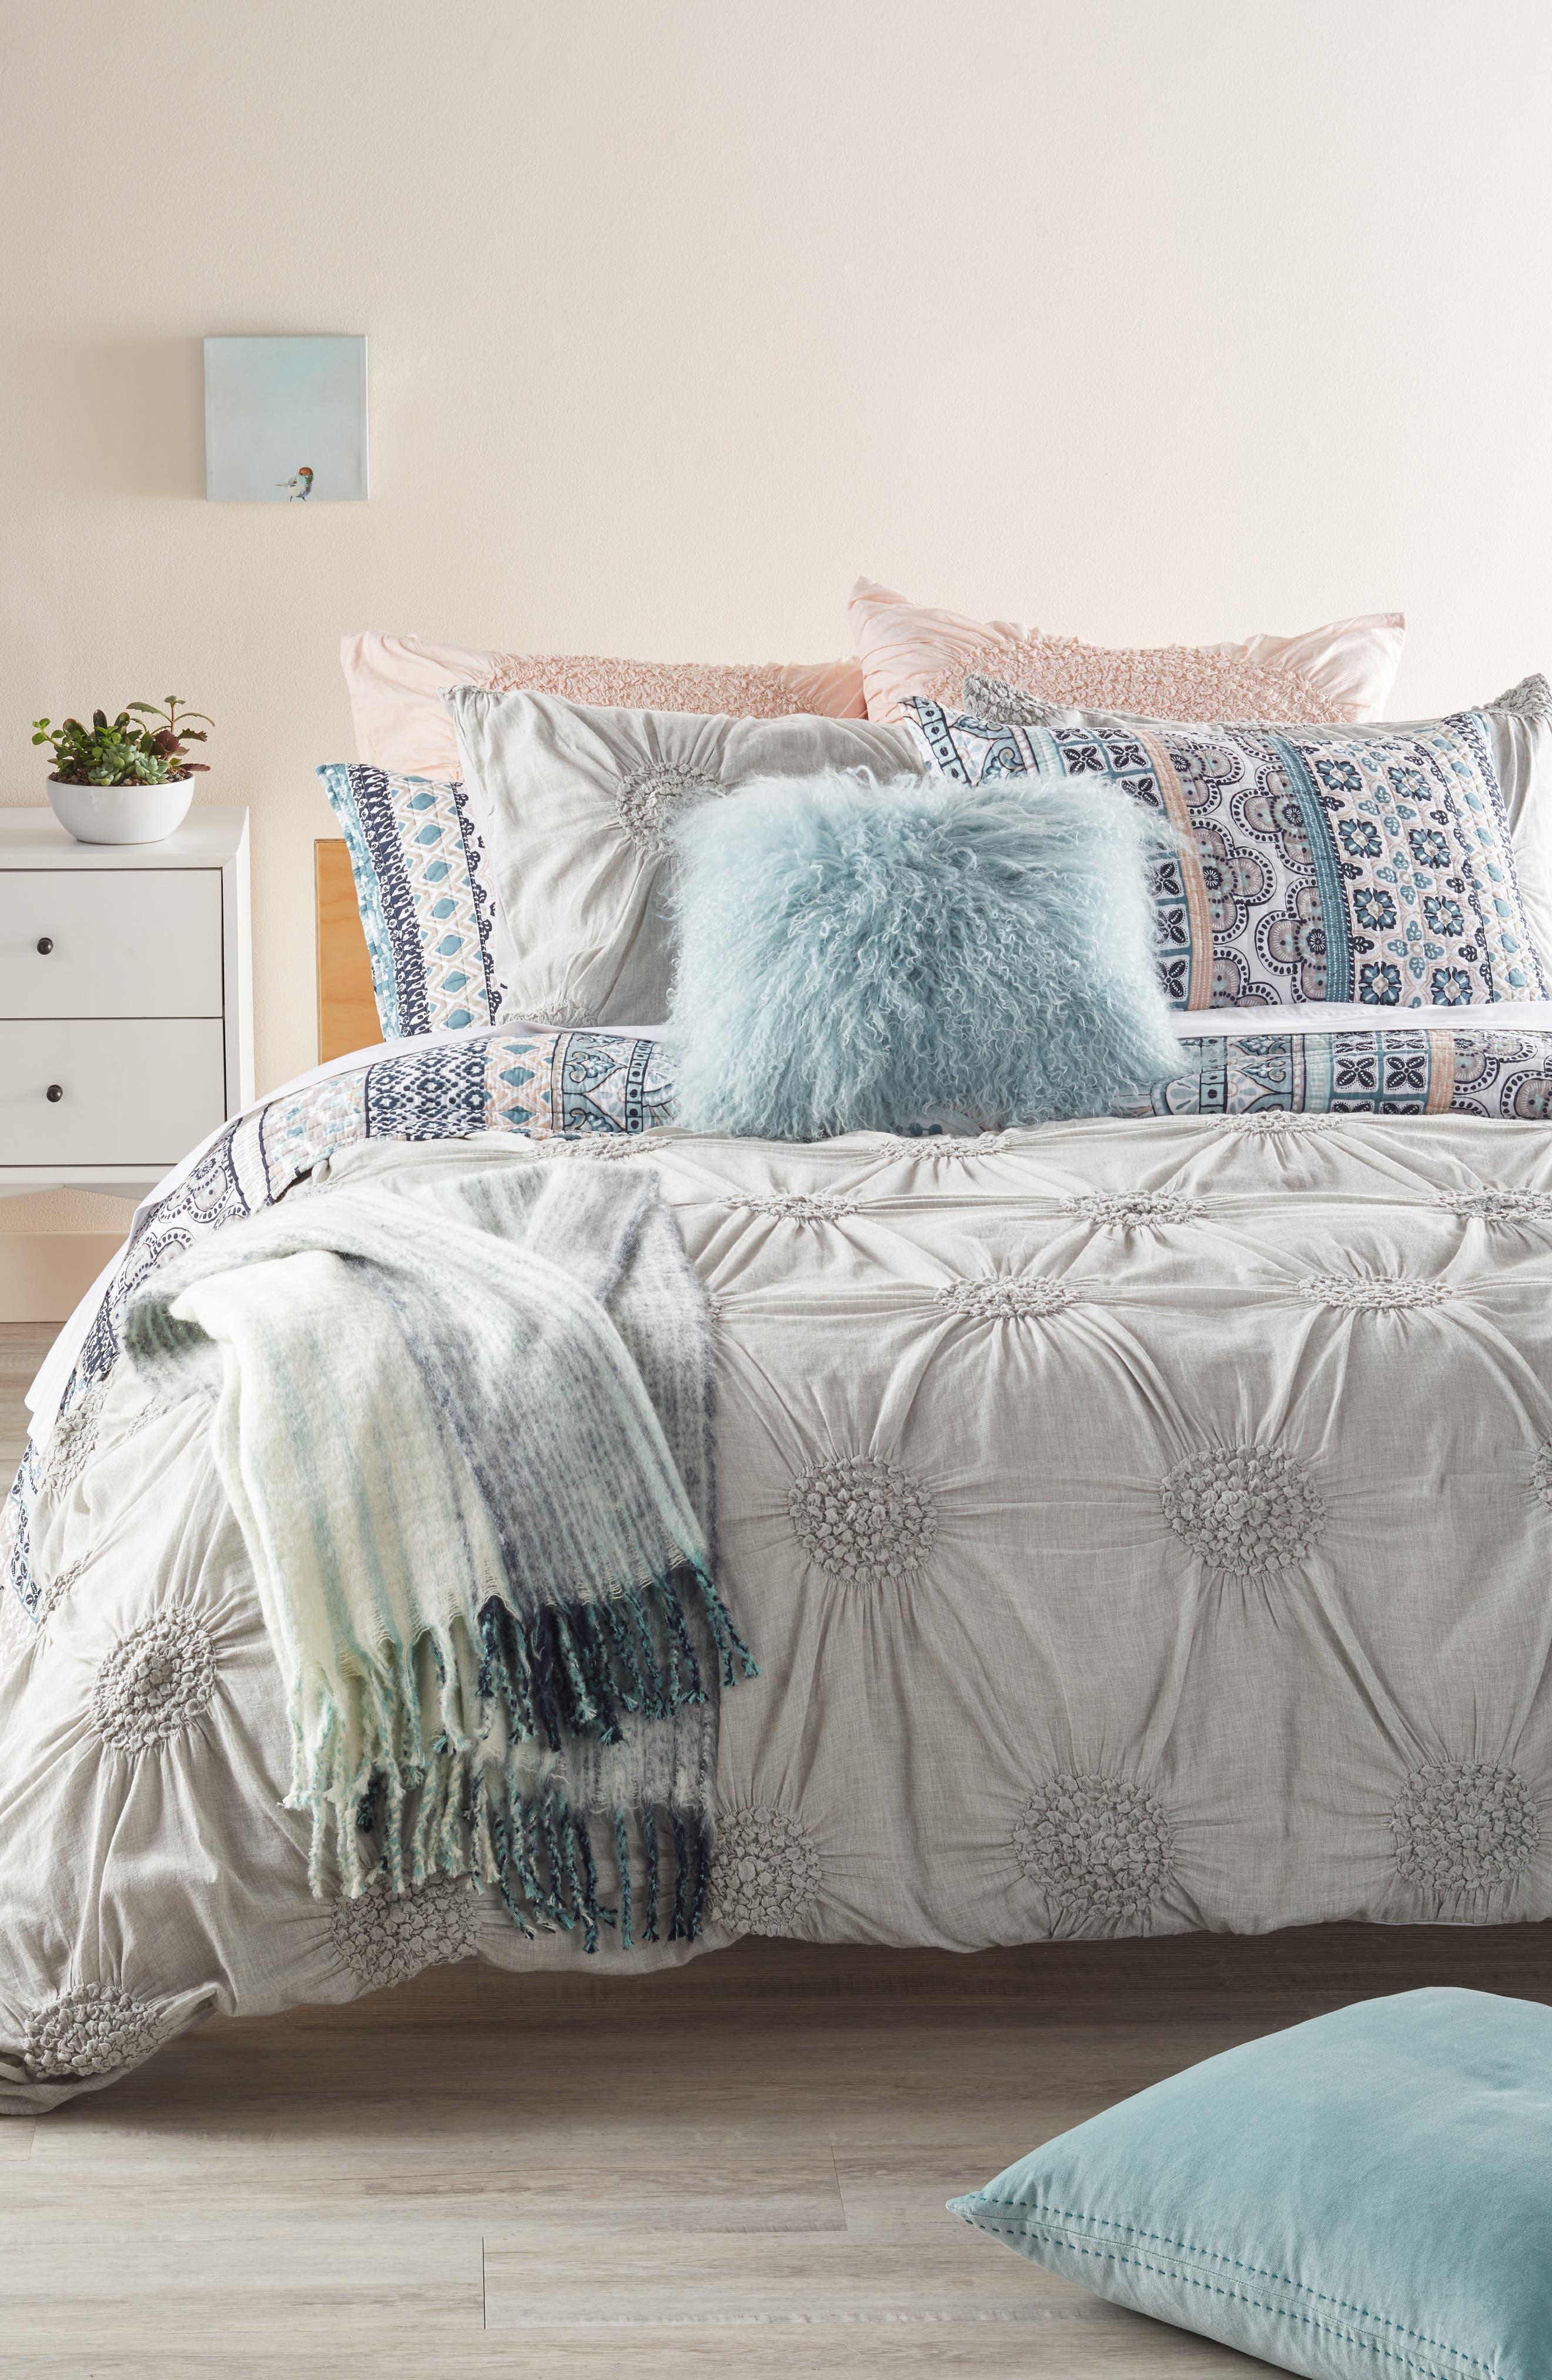 Nordstrom at Home Chloe & Levtex Addie Quilt Bedding Collection